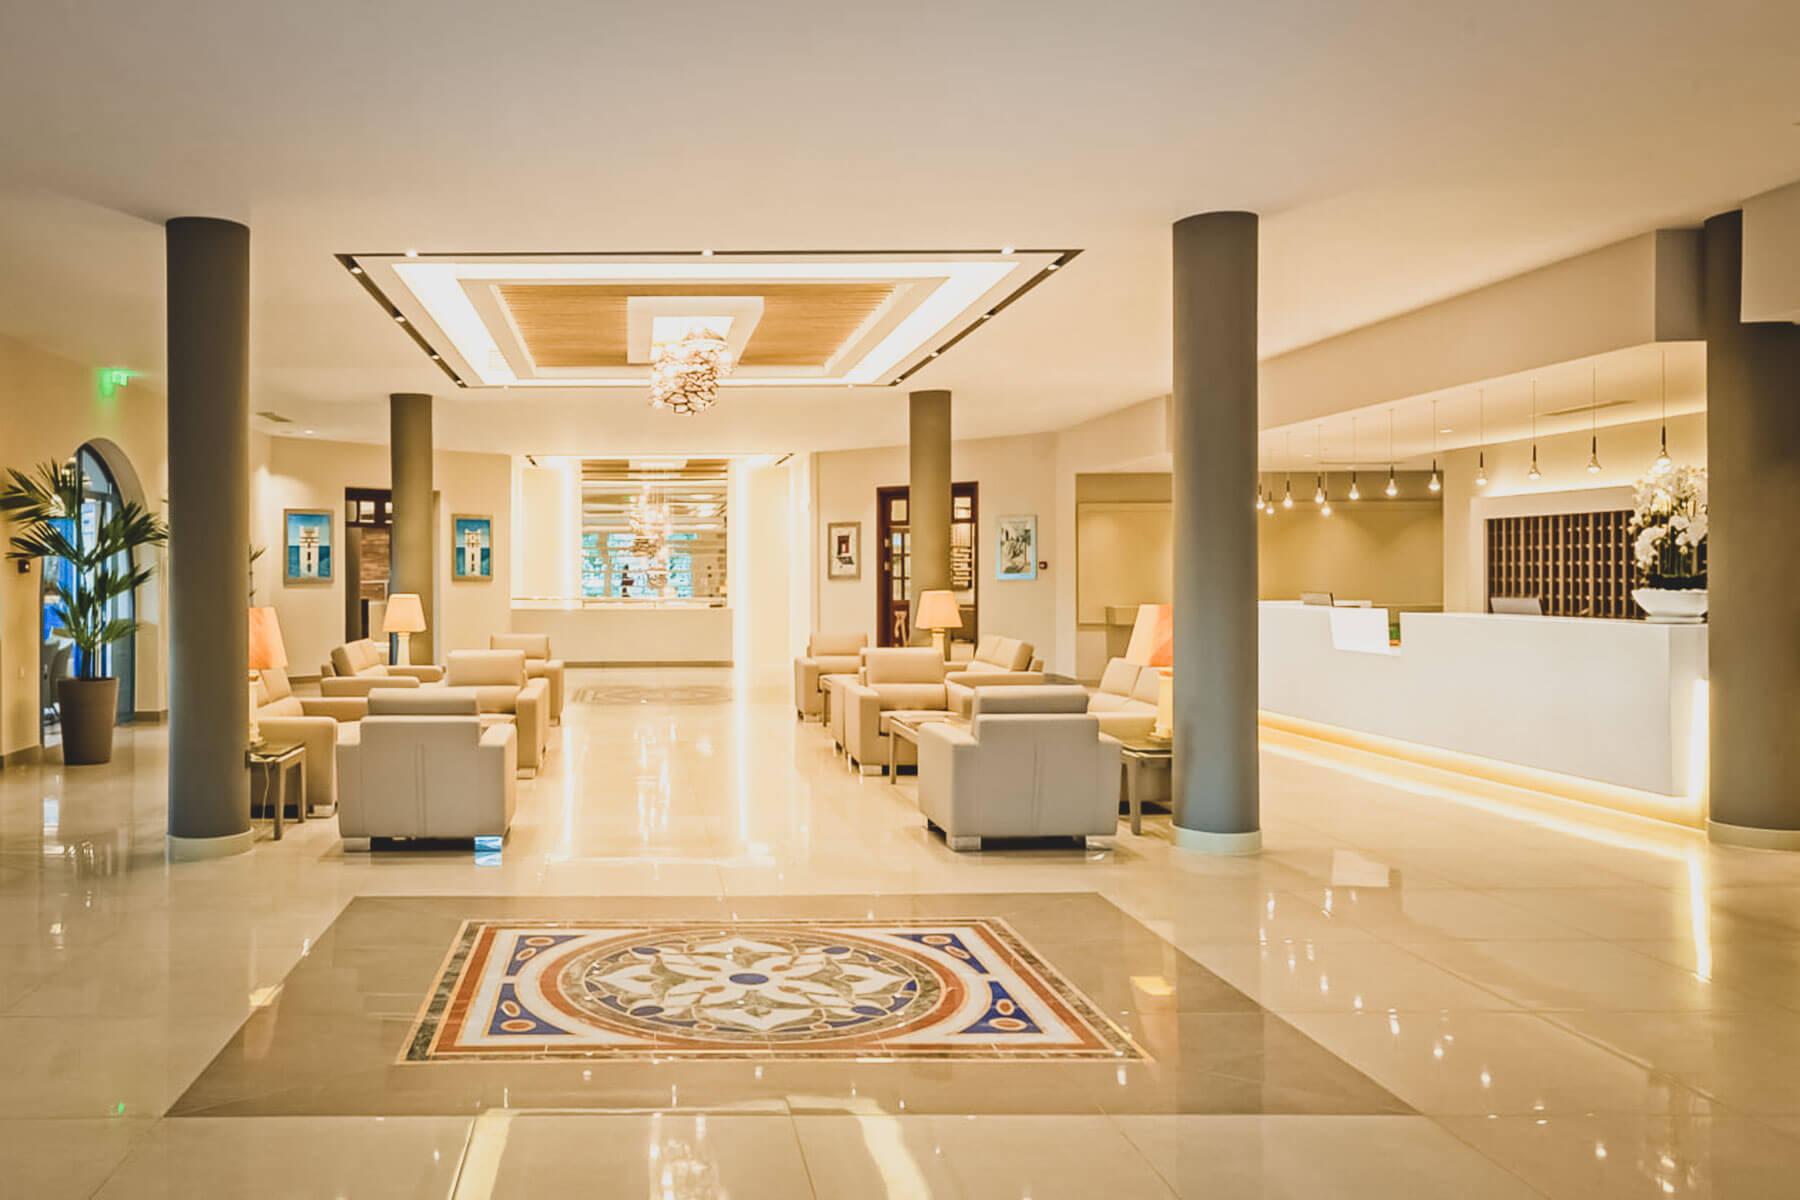 Lagas Aegean Village Hotel, Kos – GR